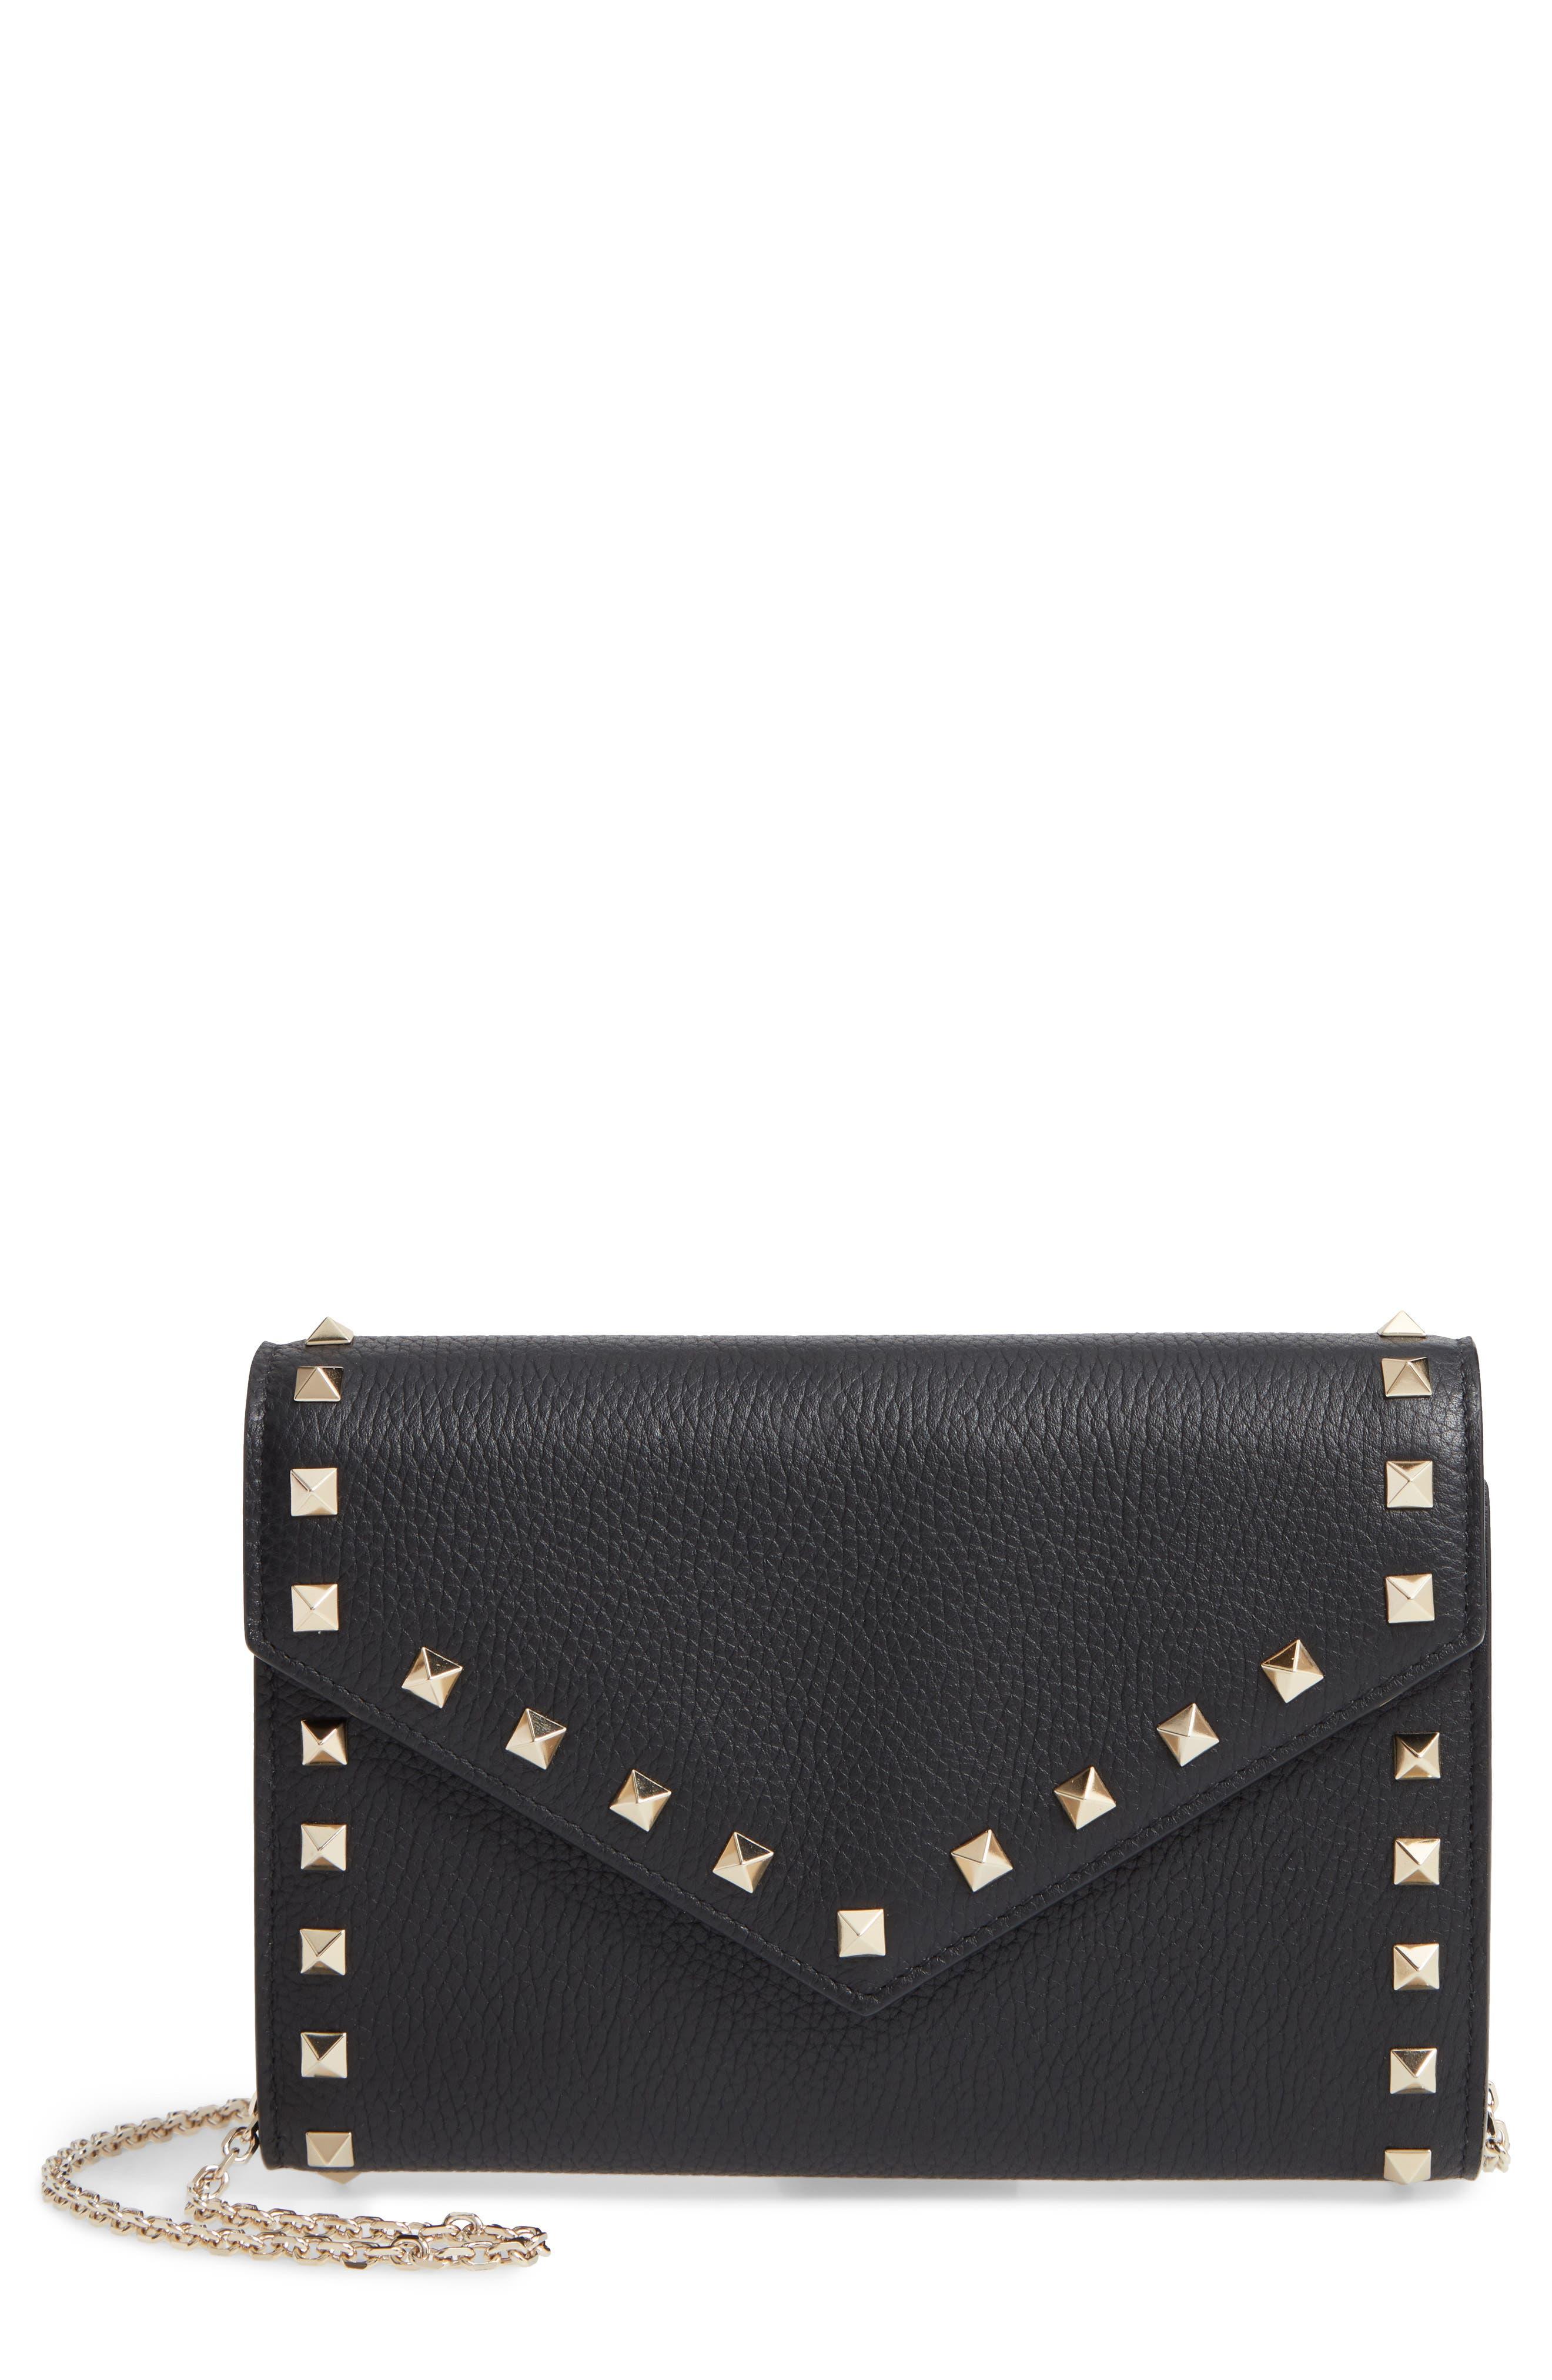 Valentino Garavani Rockstud V-Flap Calfskin Leather Wallet on a Chain   Nordstrom